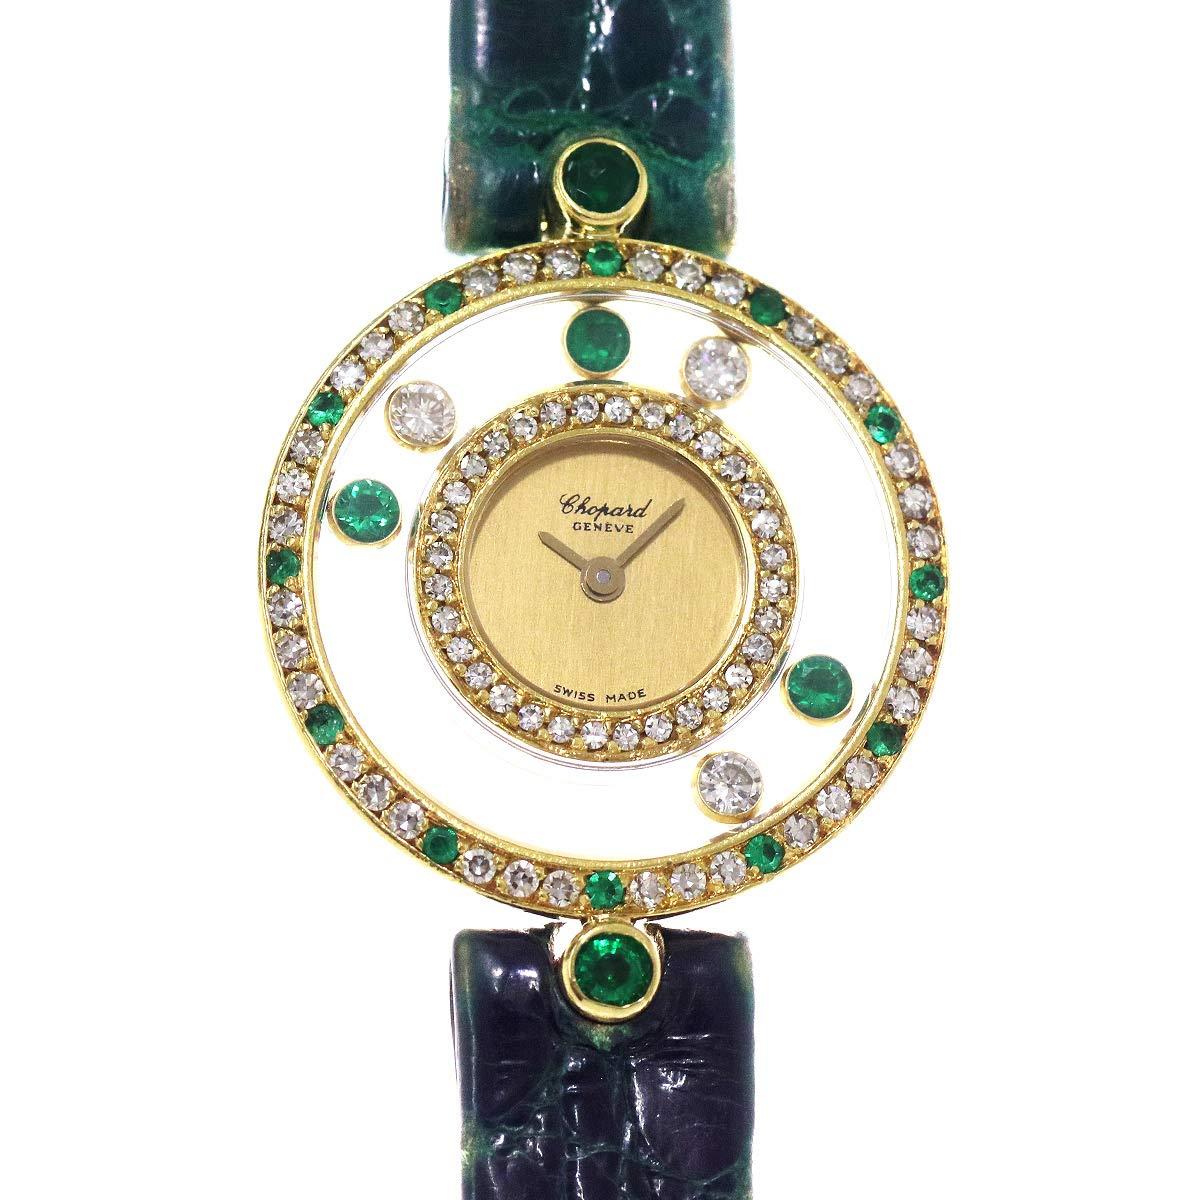 new arrival 3c02a 081c9 Amazon | ショパール Chopard ハッピーダイヤモンド 20 4191 22 ...